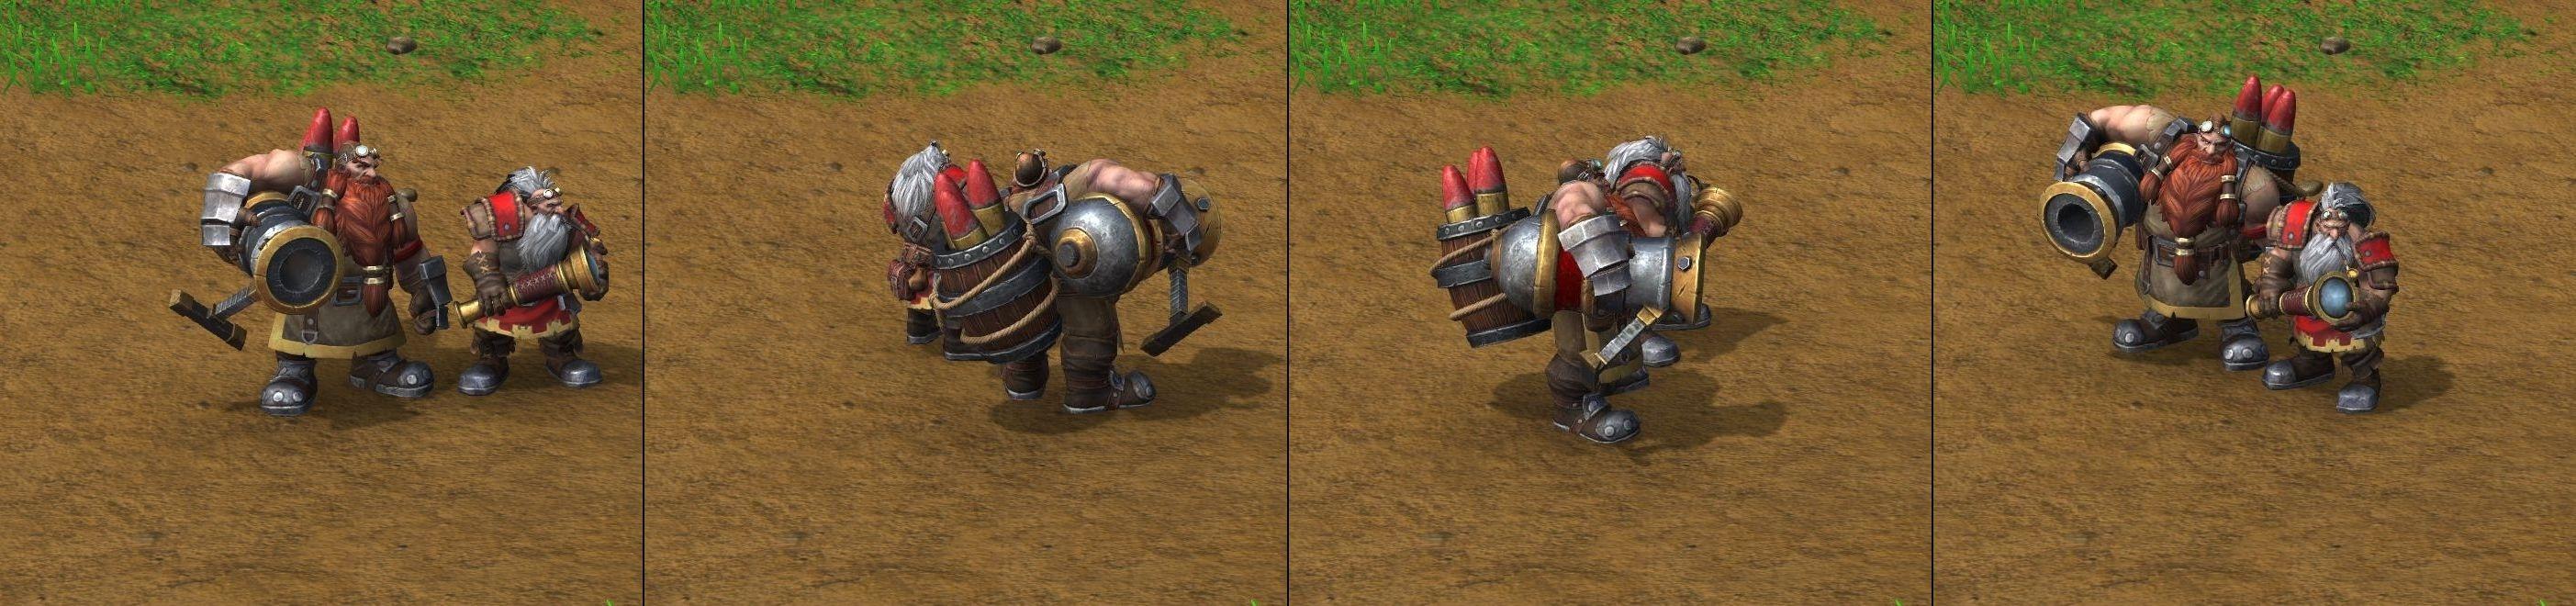 Warcraft 3 Reforged Mortar Team